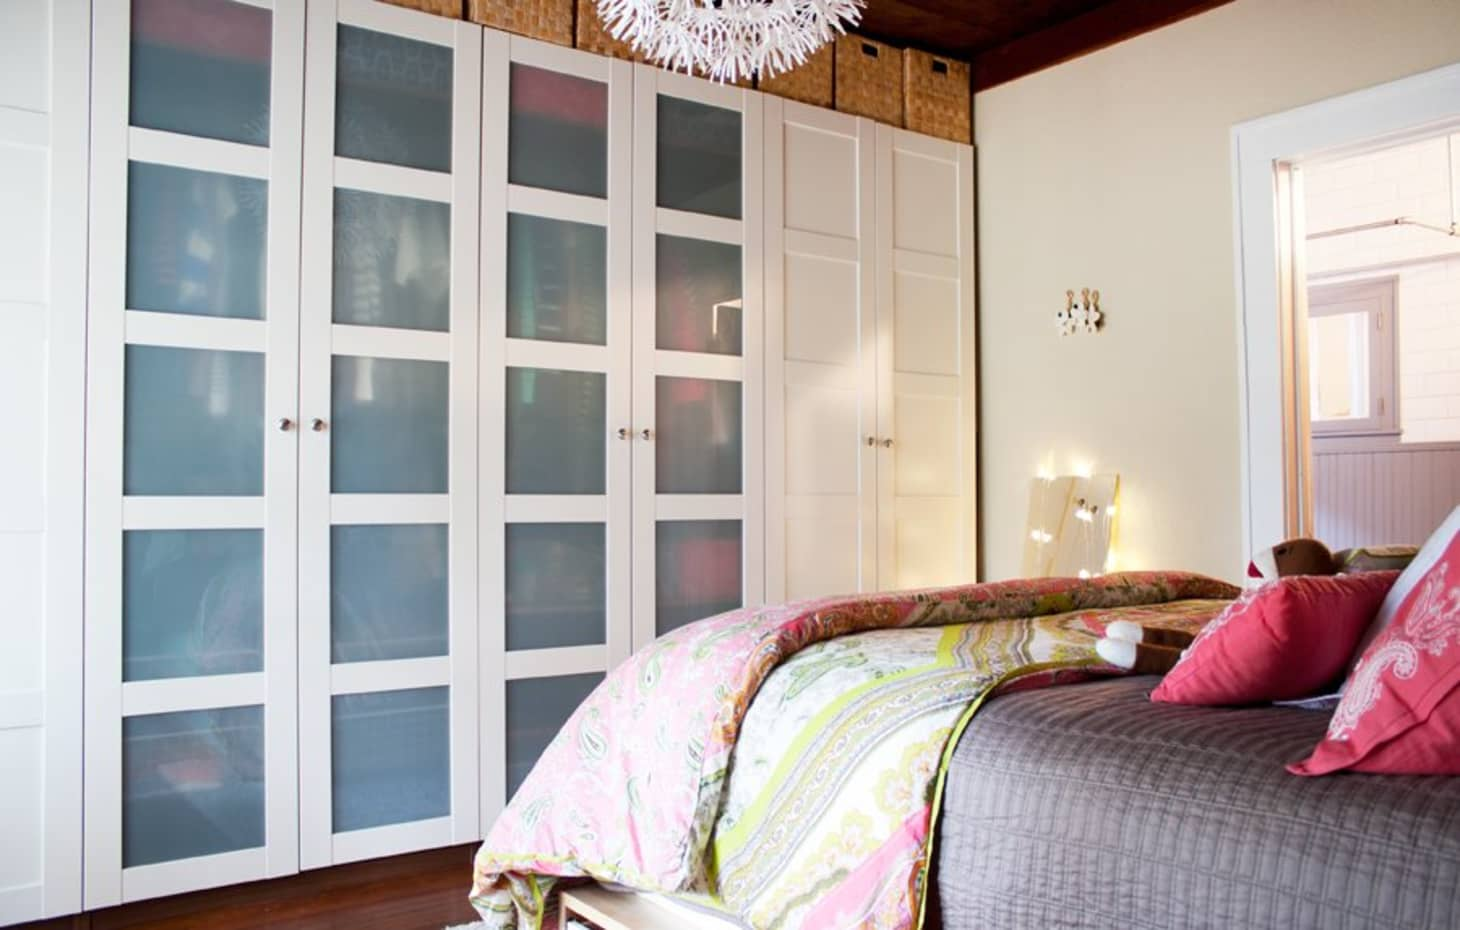 Bedroom Storage Ideas - Small Bedroom Organization ... on Small Apartment Organization  id=60724